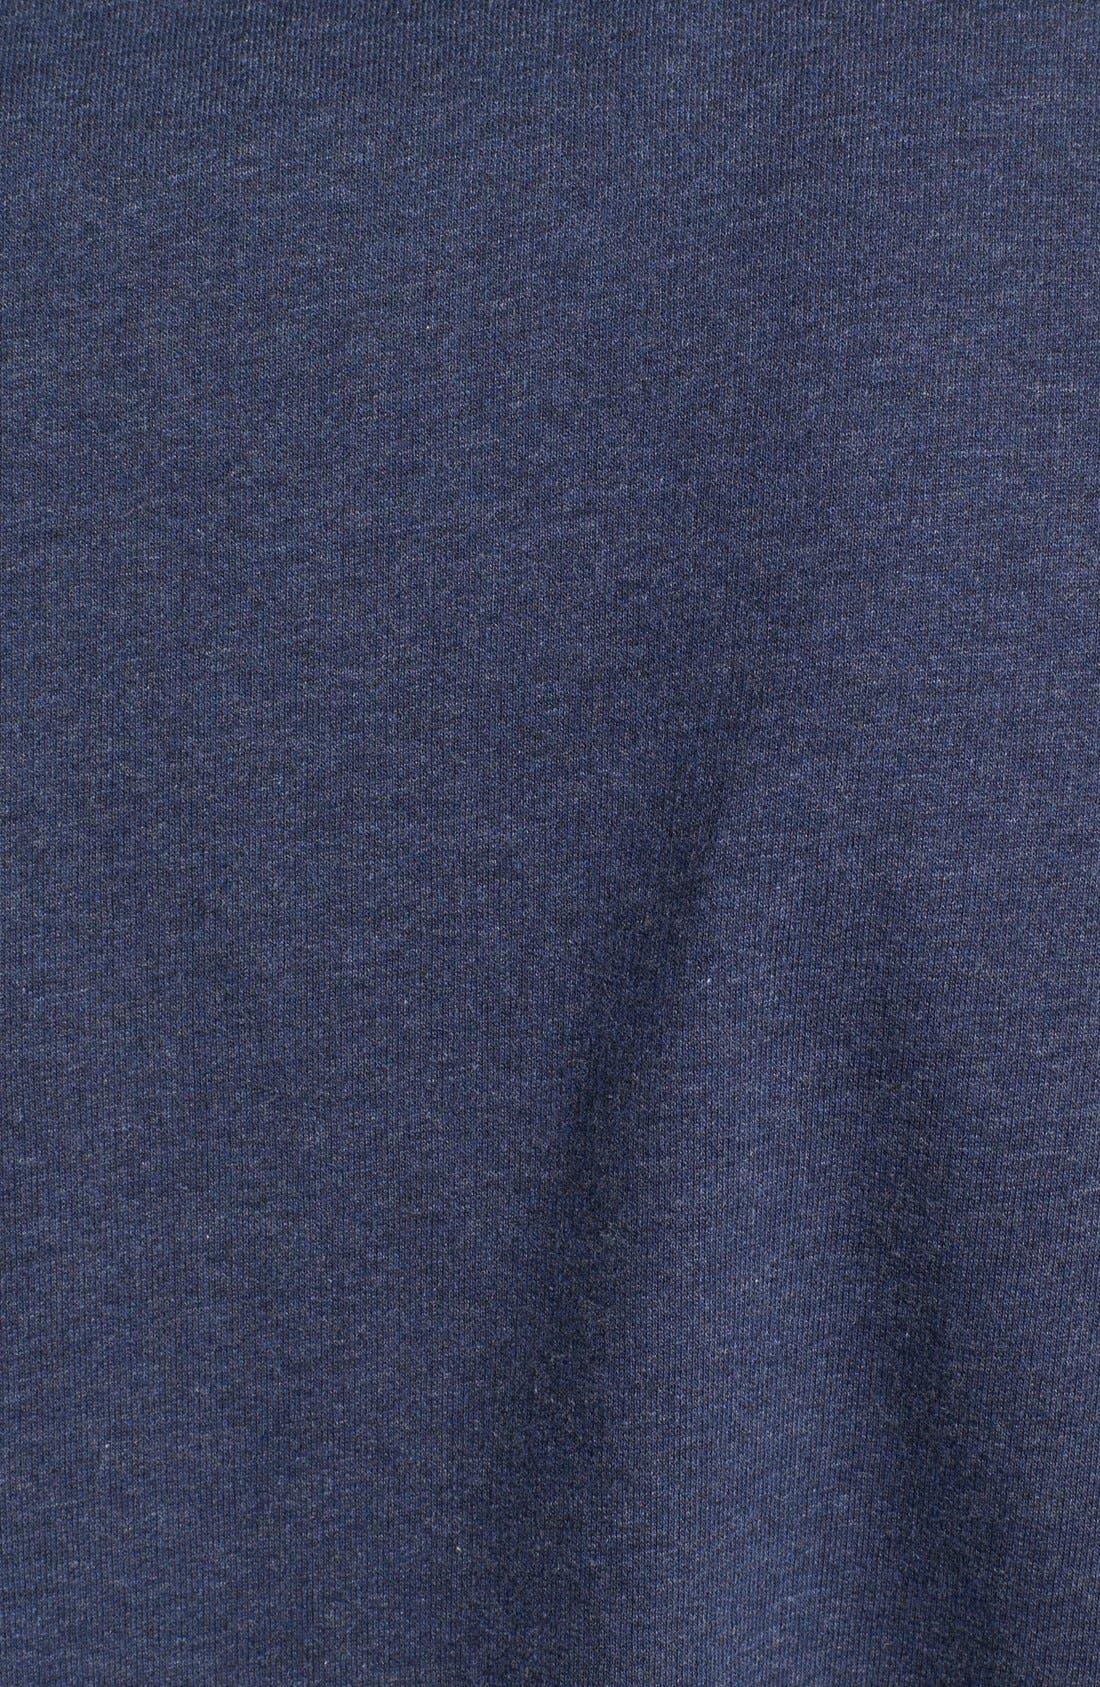 Alternate Image 3  - BOSS HUGO BOSS 'Innovation 4' Jacket